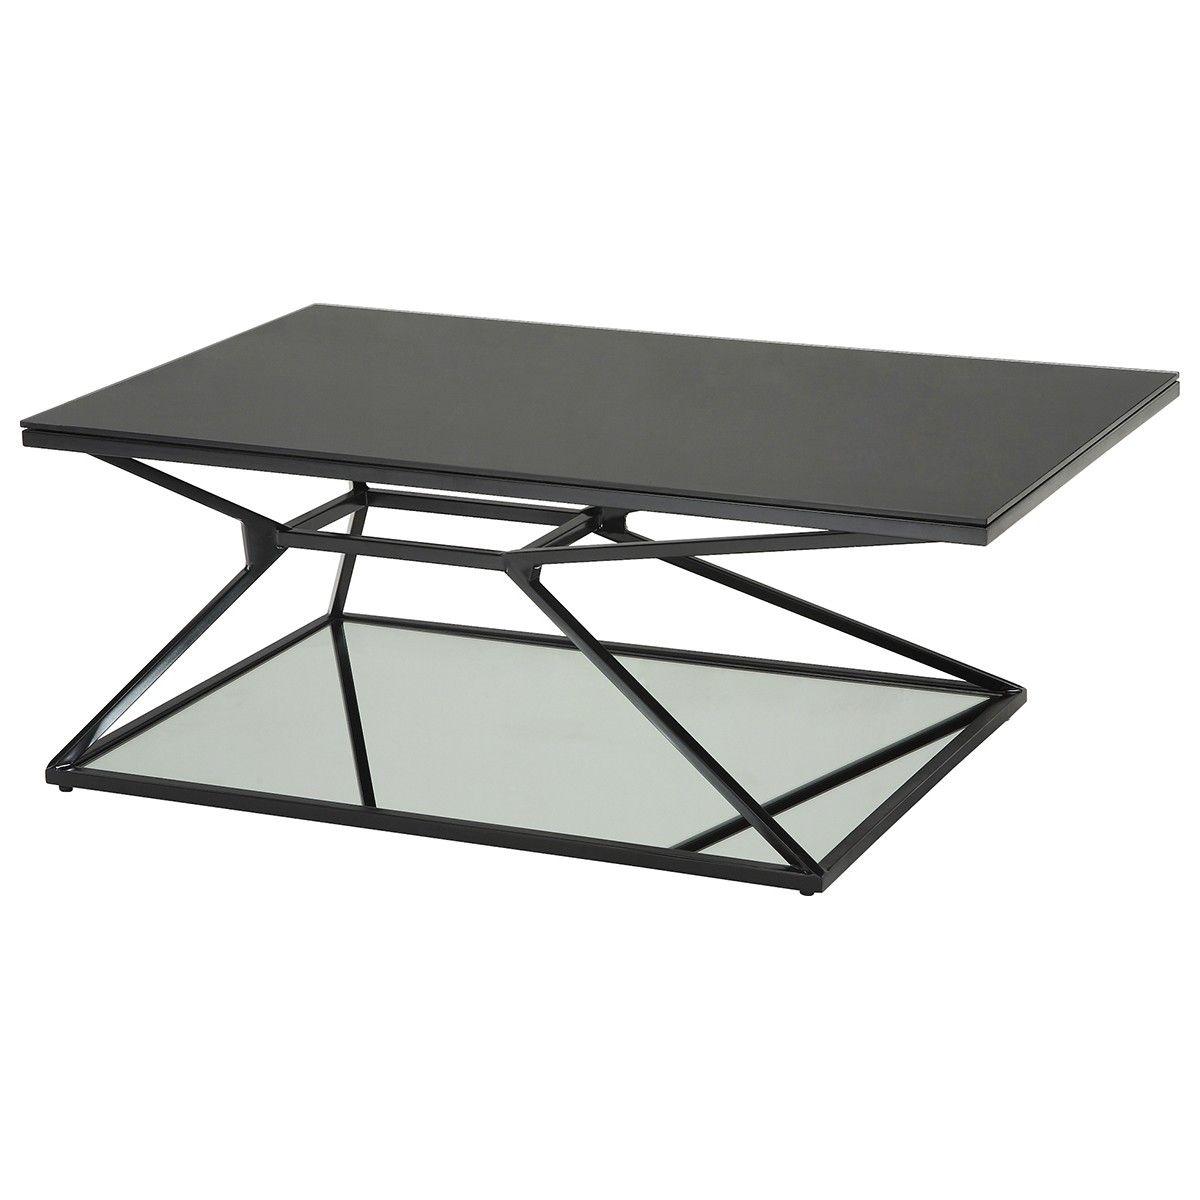 Wedge coffee table 1421 sunpan sunpan coffee tables wedge coffee table 1421 sunpan sunpan geotapseo Gallery